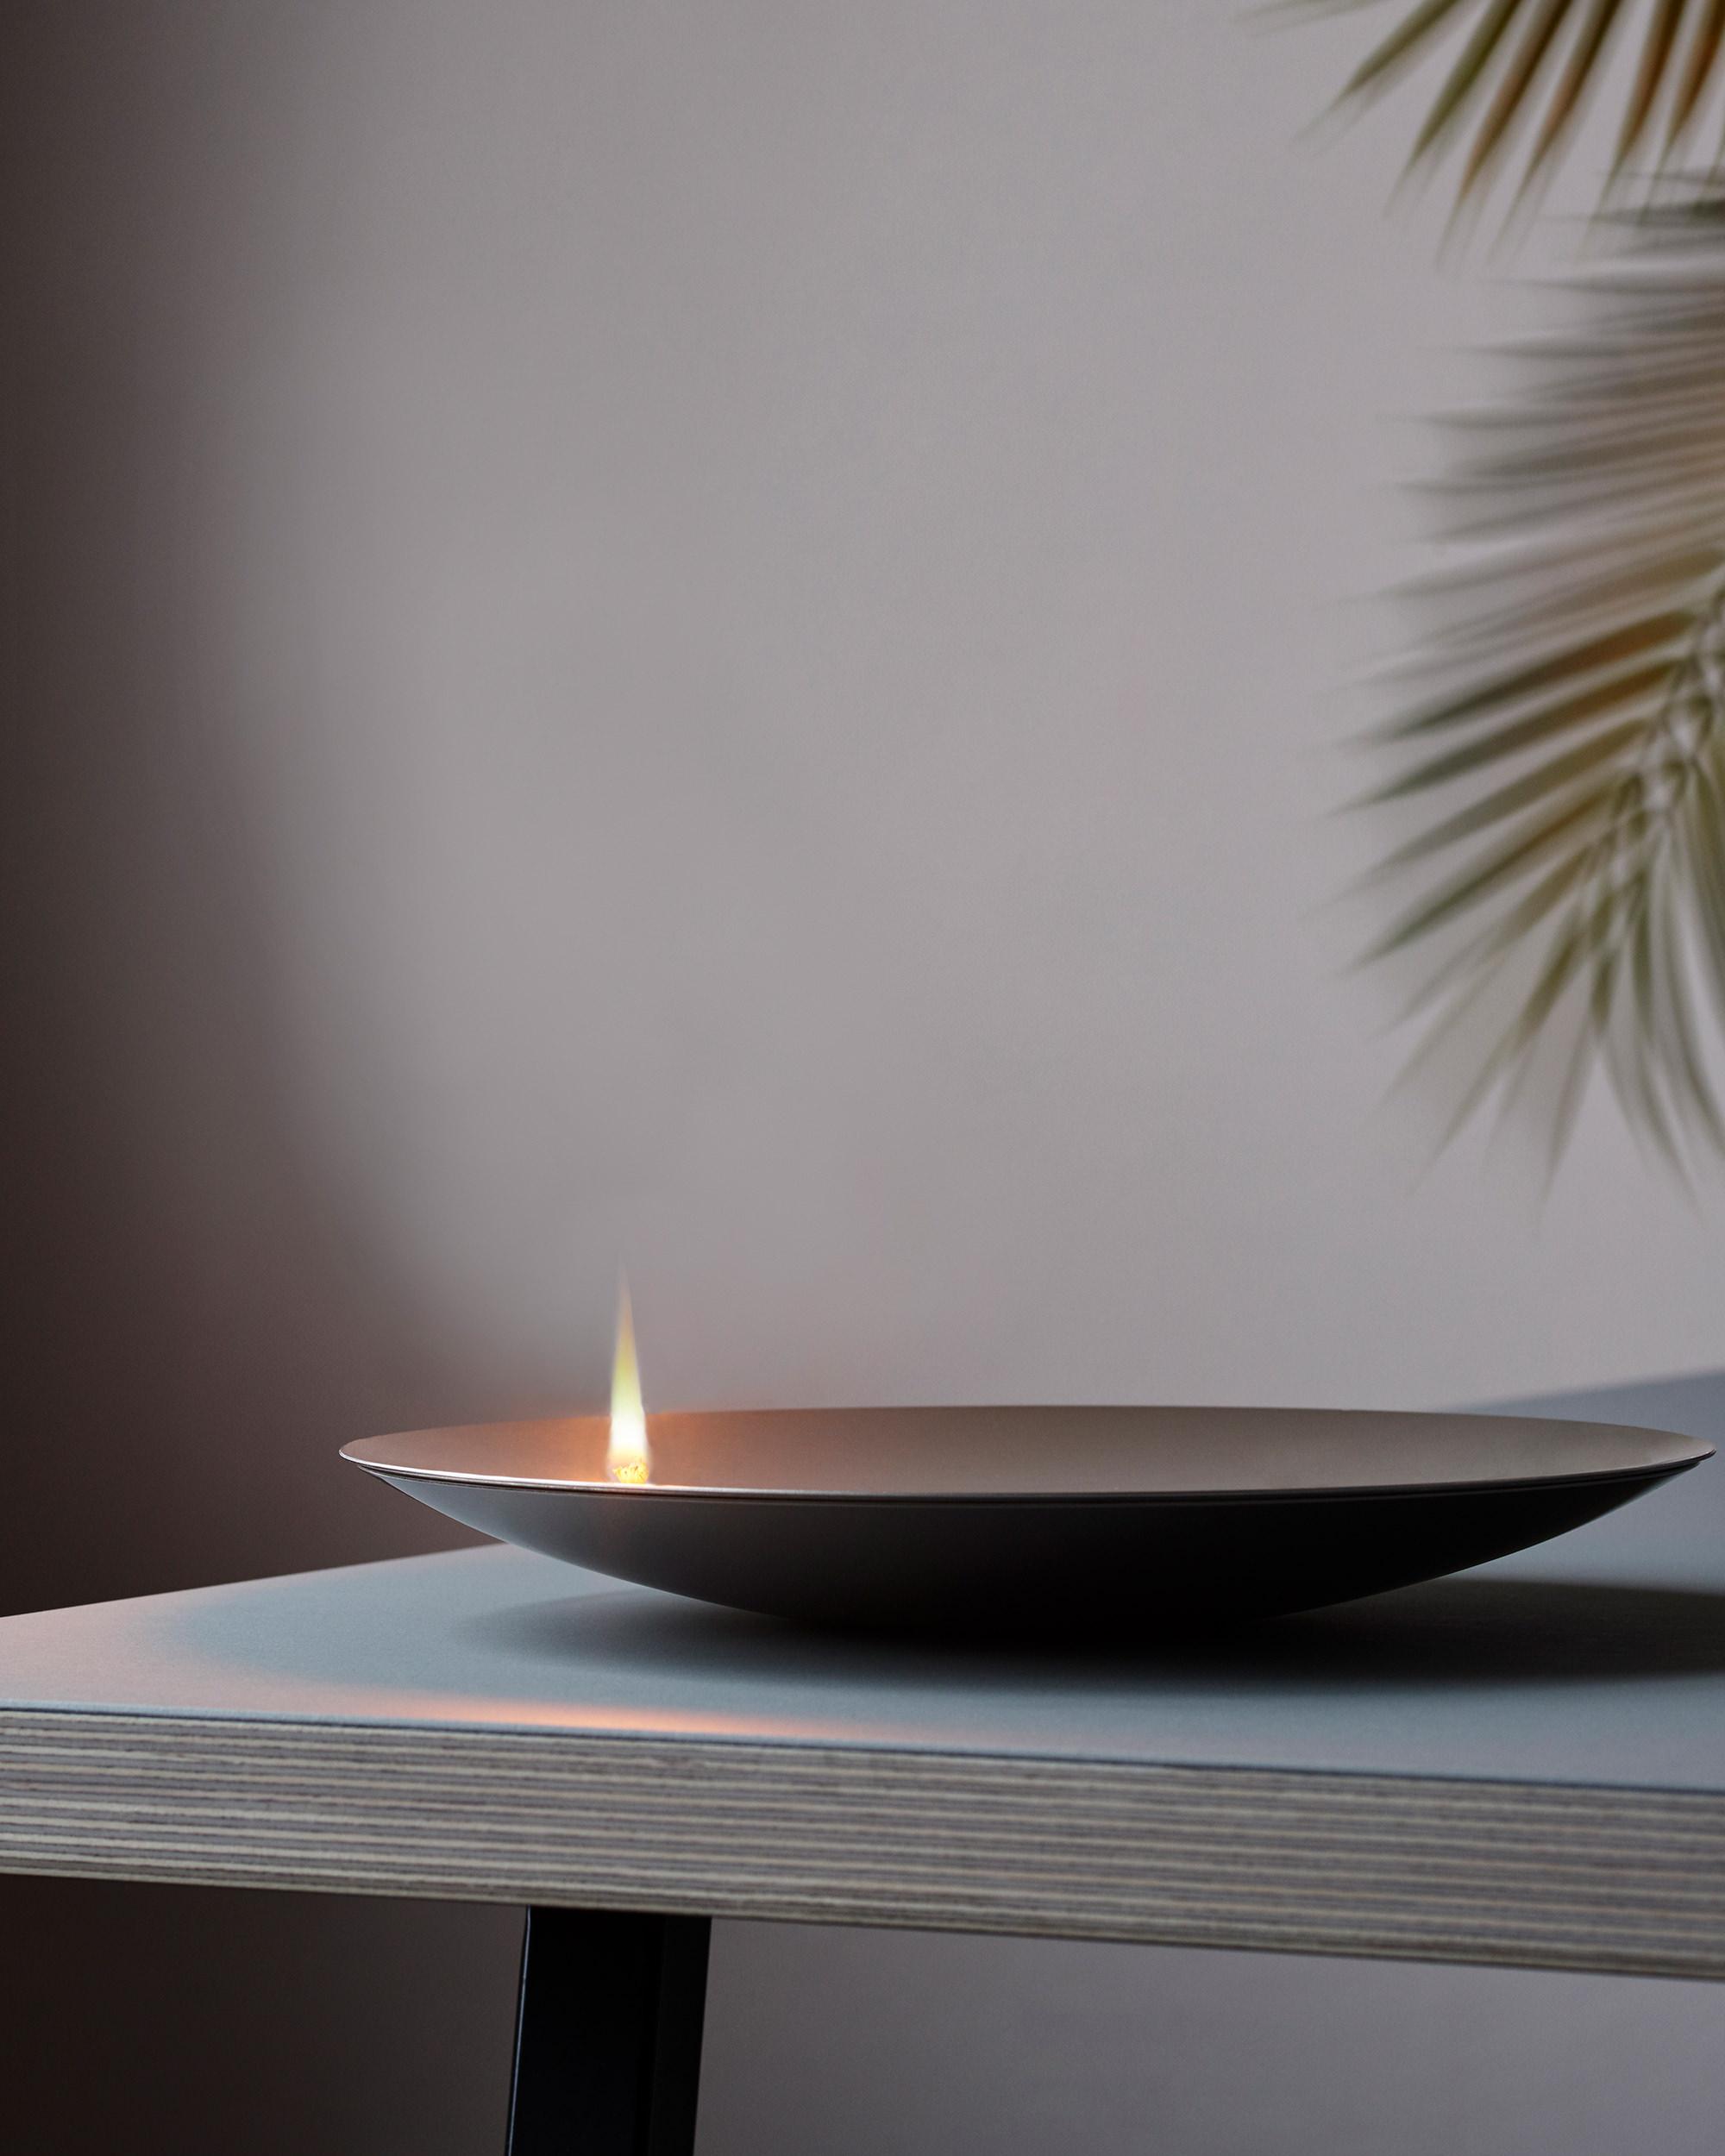 Mono Concave Flammschale Oil lamp Credits Fabian Frinzel